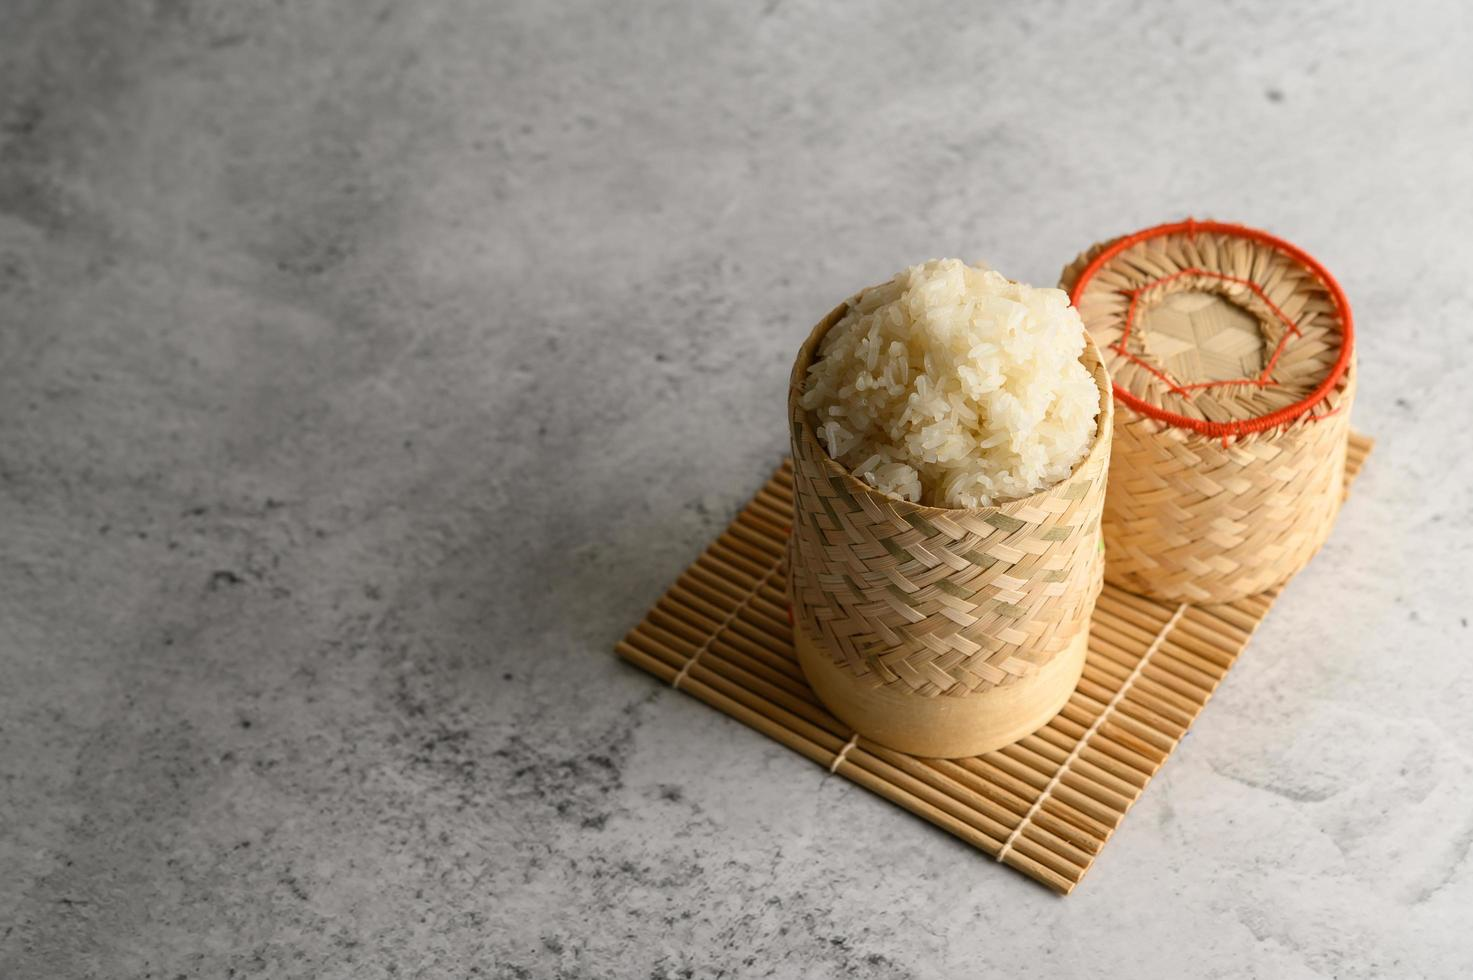 riz gluant thaï dans un panier en bambou tressé photo